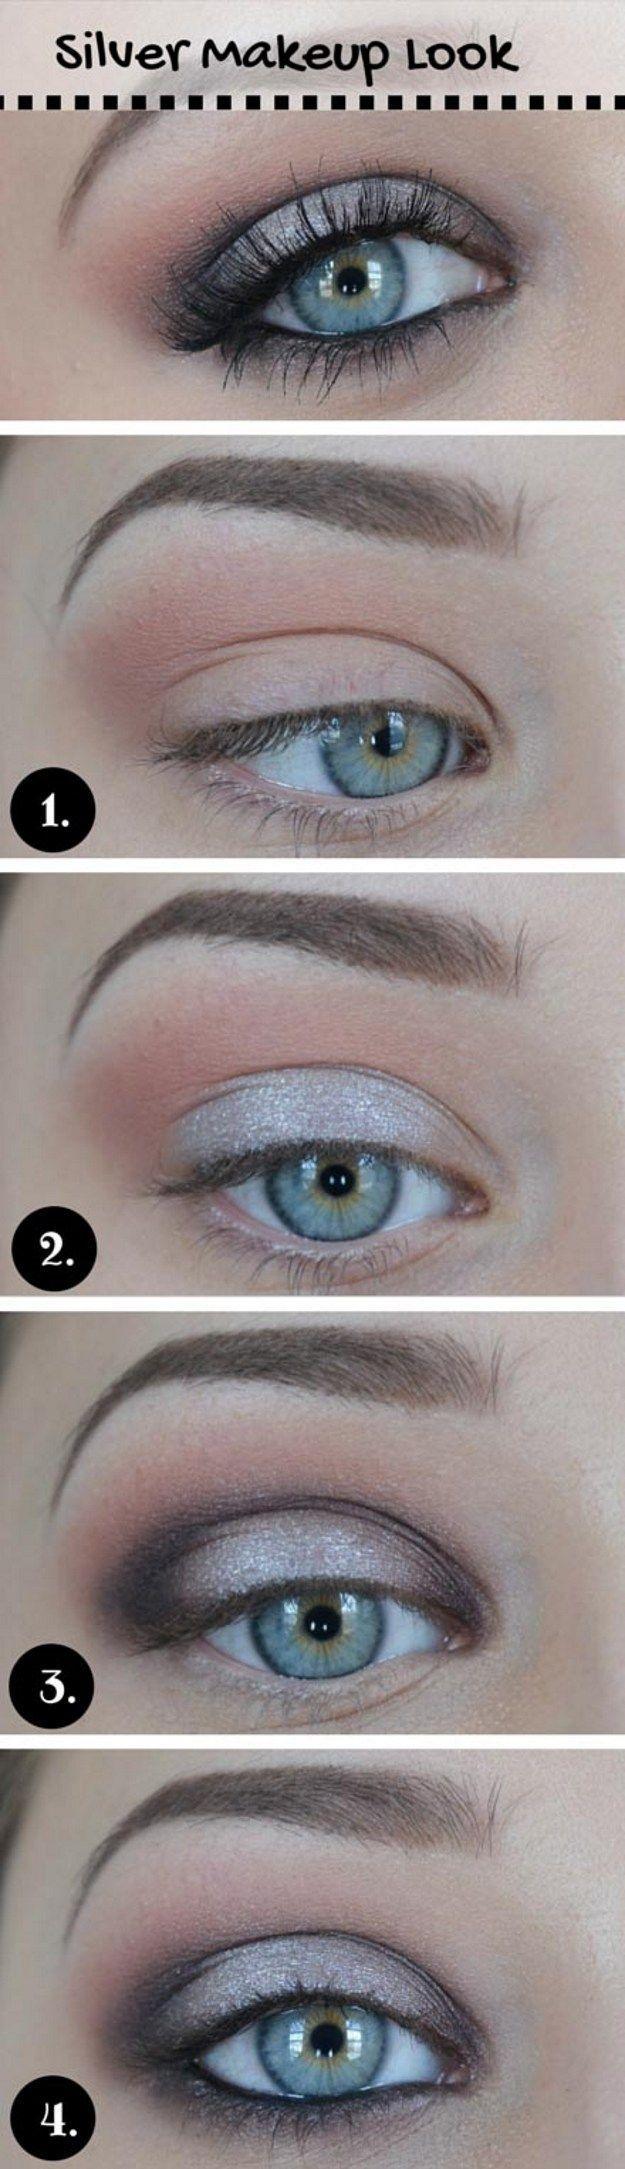 Diy tips makeup tutorials 2017 2018 how to do silver eye silver metallic tutorial for blue eyesbeauty tricks makeup baditri Image collections